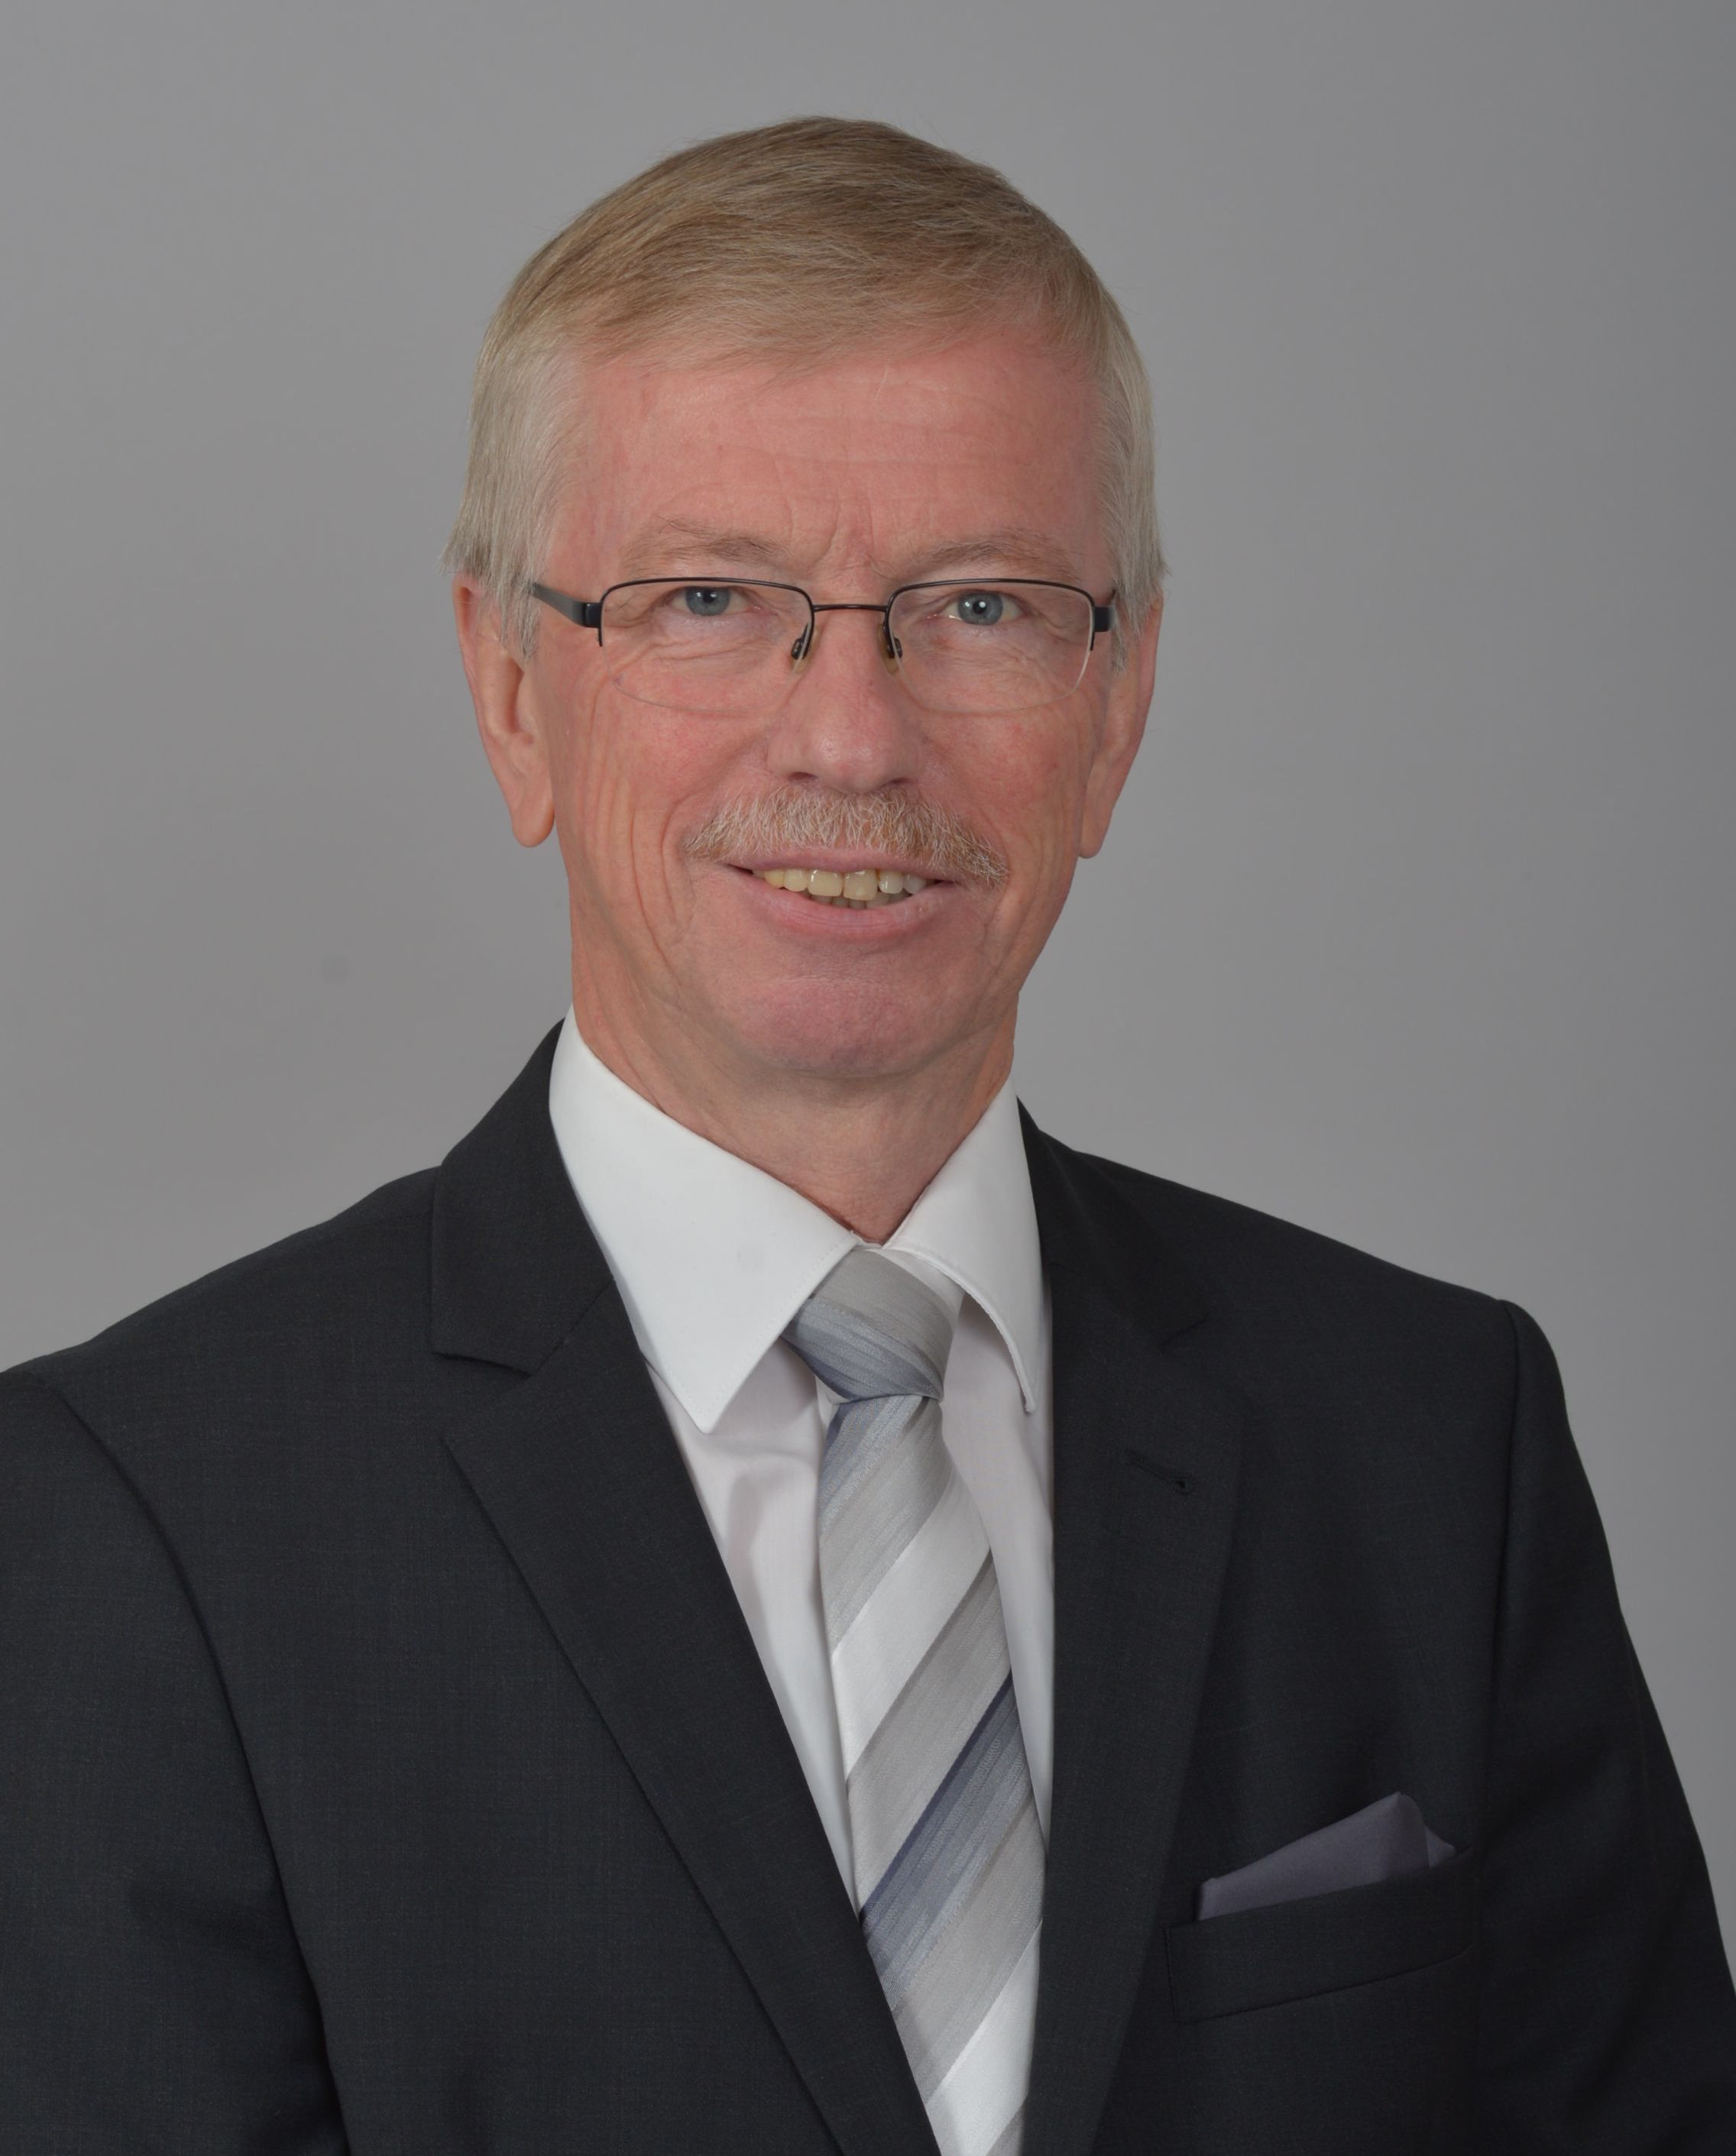 Hubert Wissing